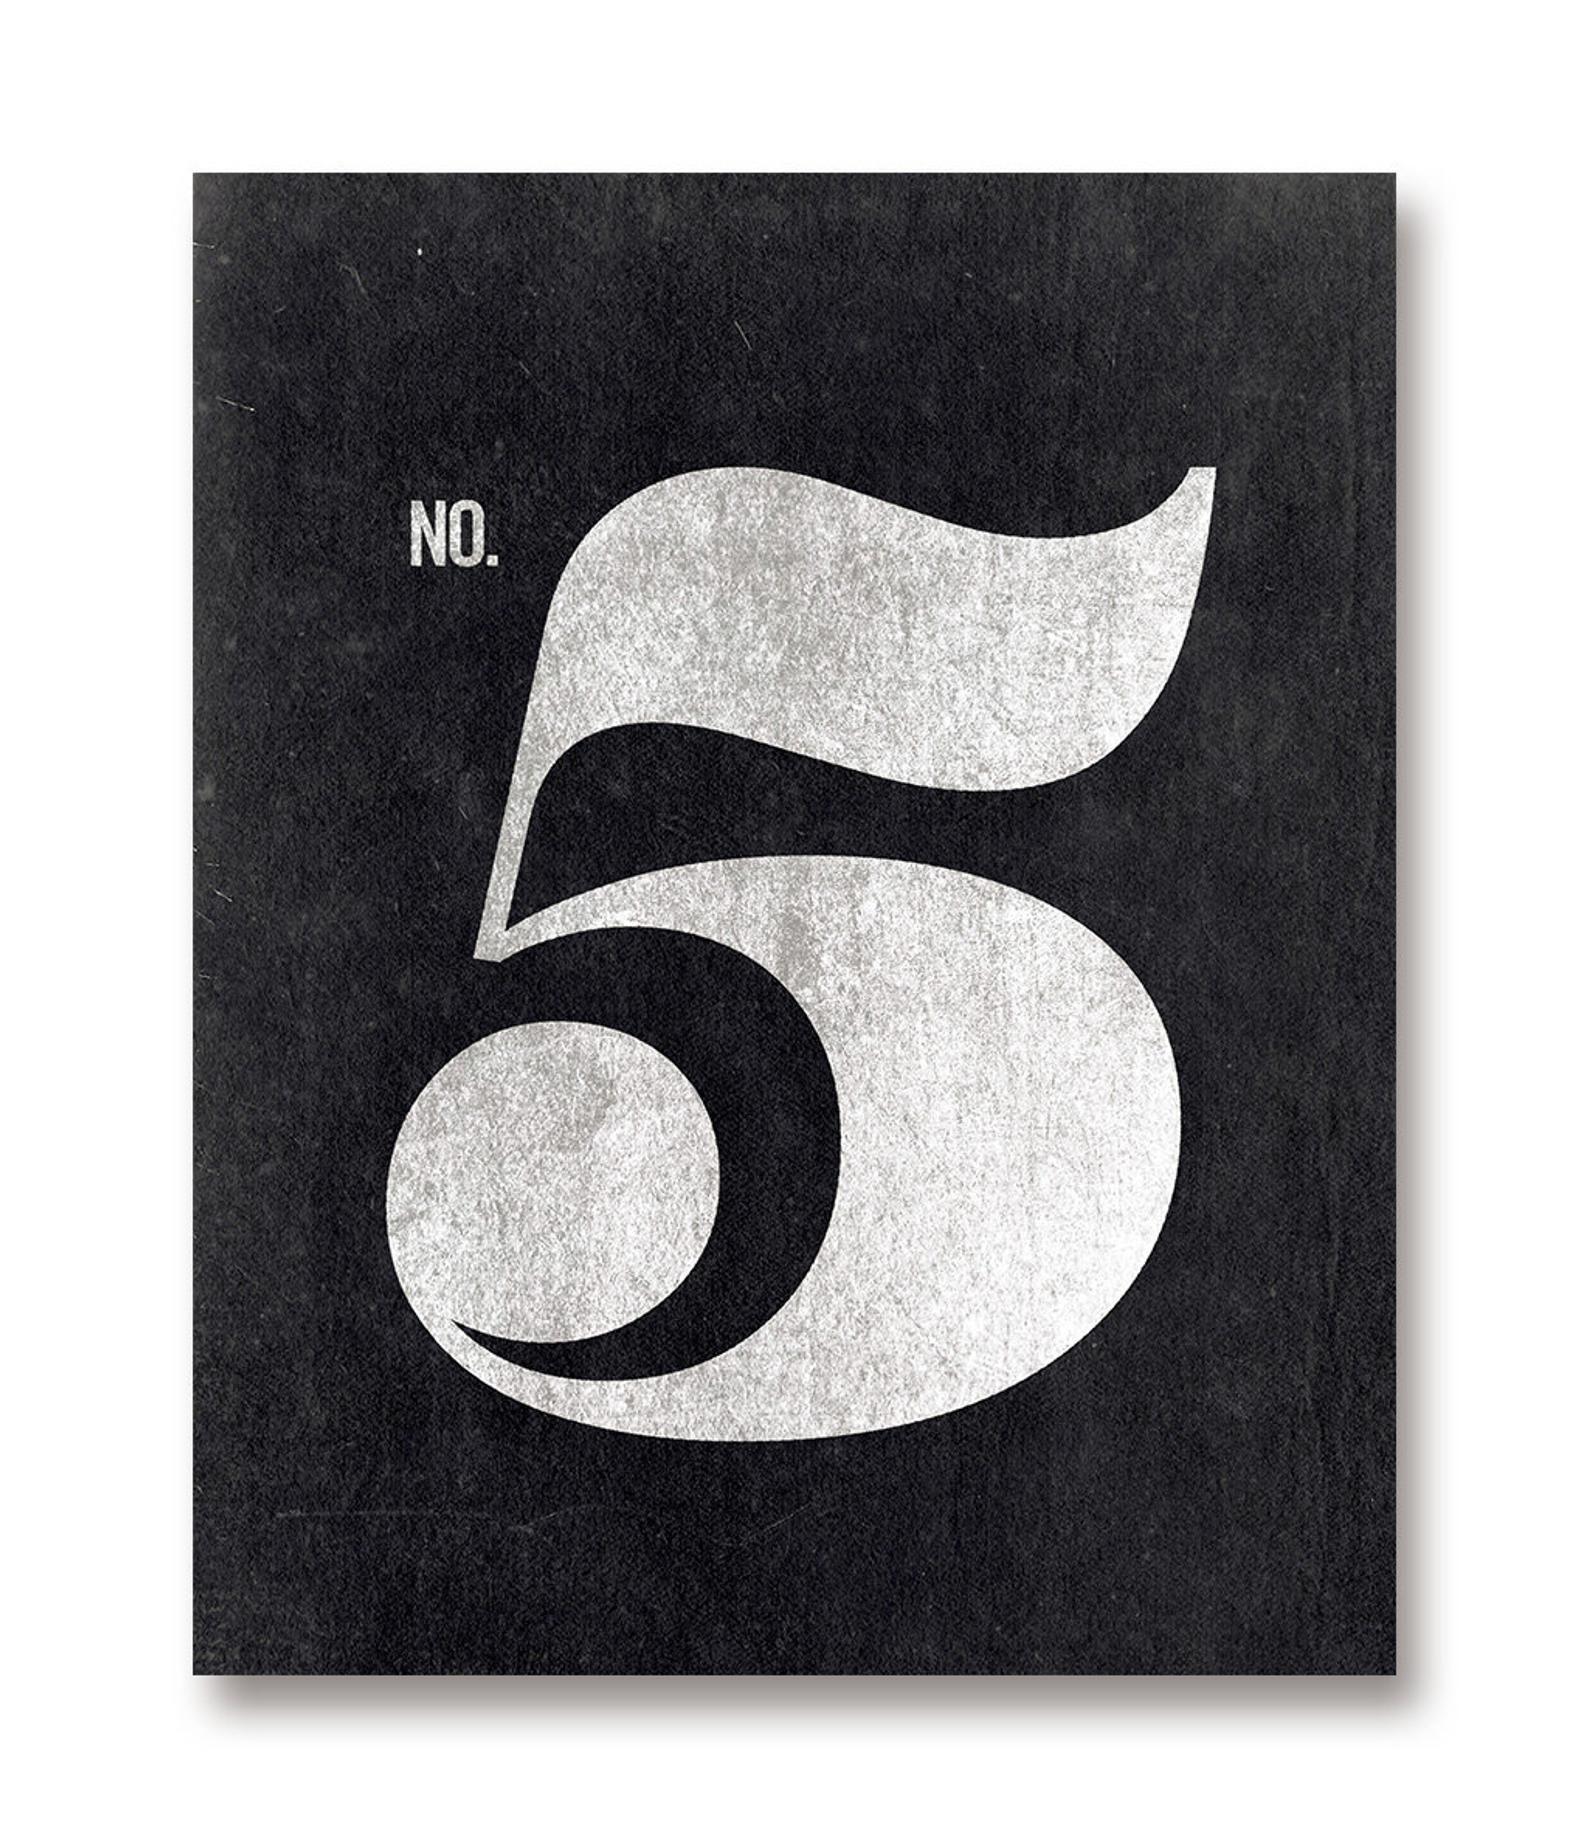 Number 5 Print Number 5 Sign Printable Art Scandinavian Etsy In 2020 Numbers Typography Printable Art Typography Prints